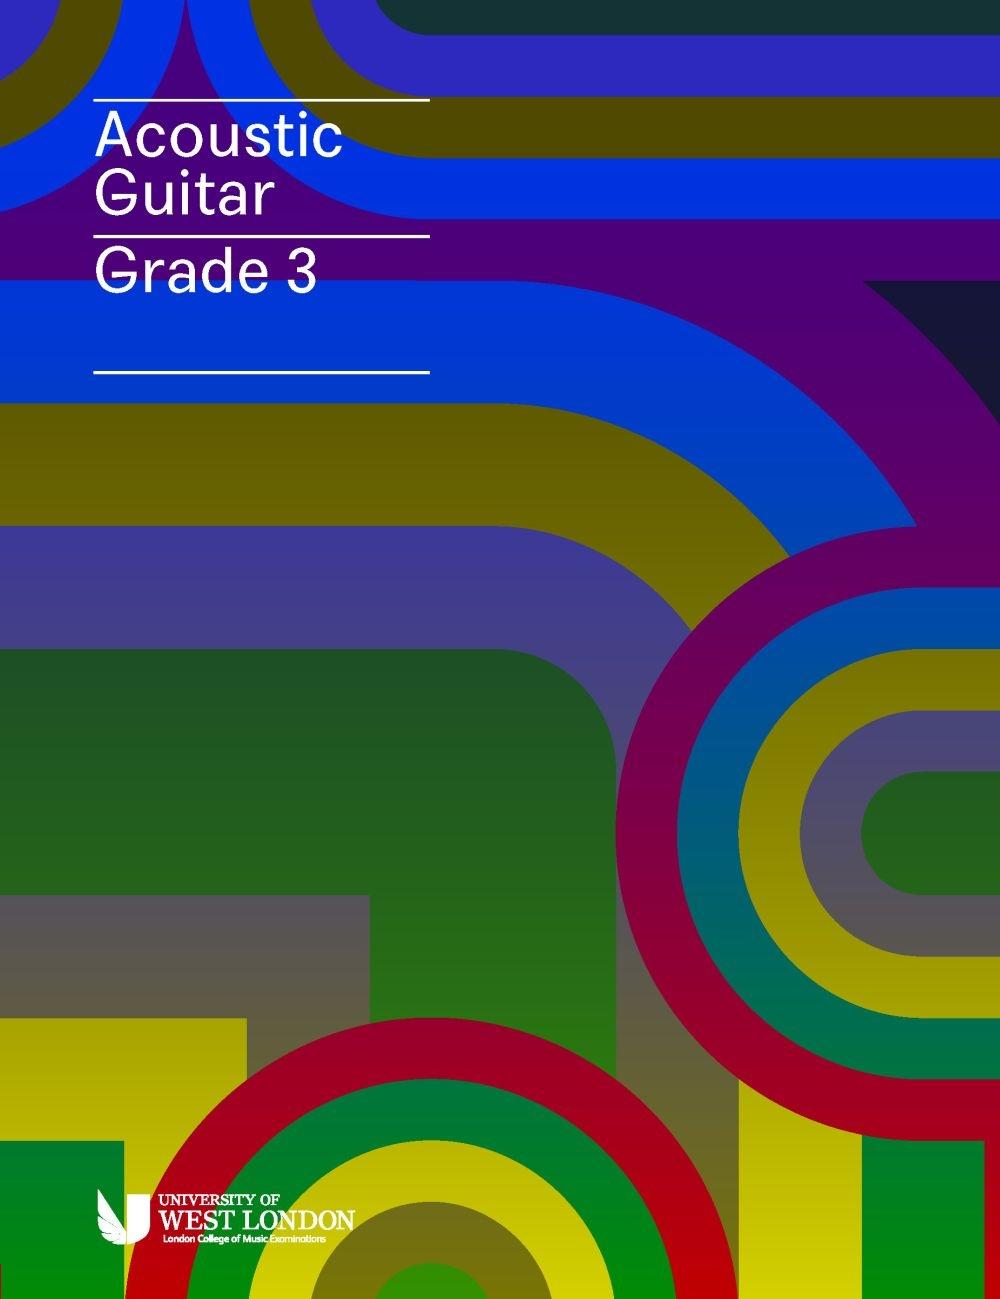 LCM Acoustic Guitar Handbook Grade 3 2020: Acoustic Guitar: Instrumental Tutor